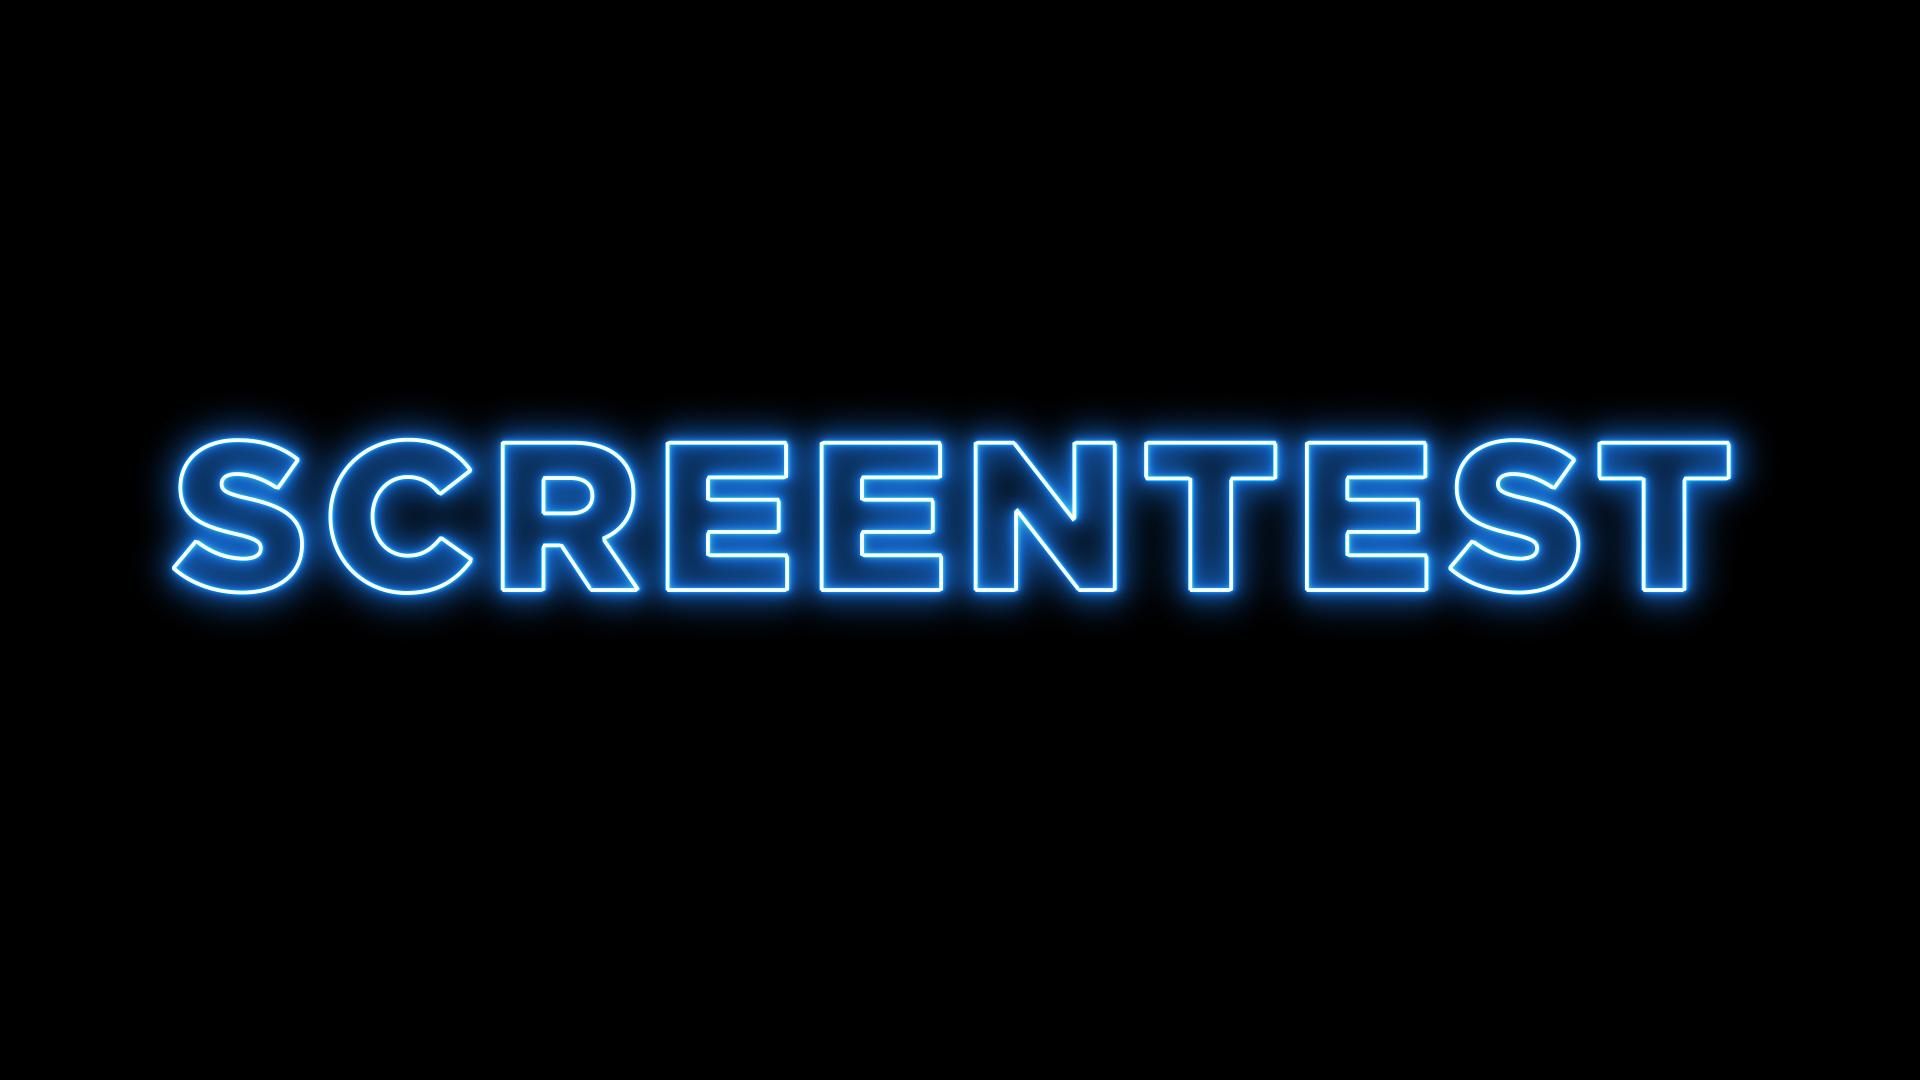 Screentest -